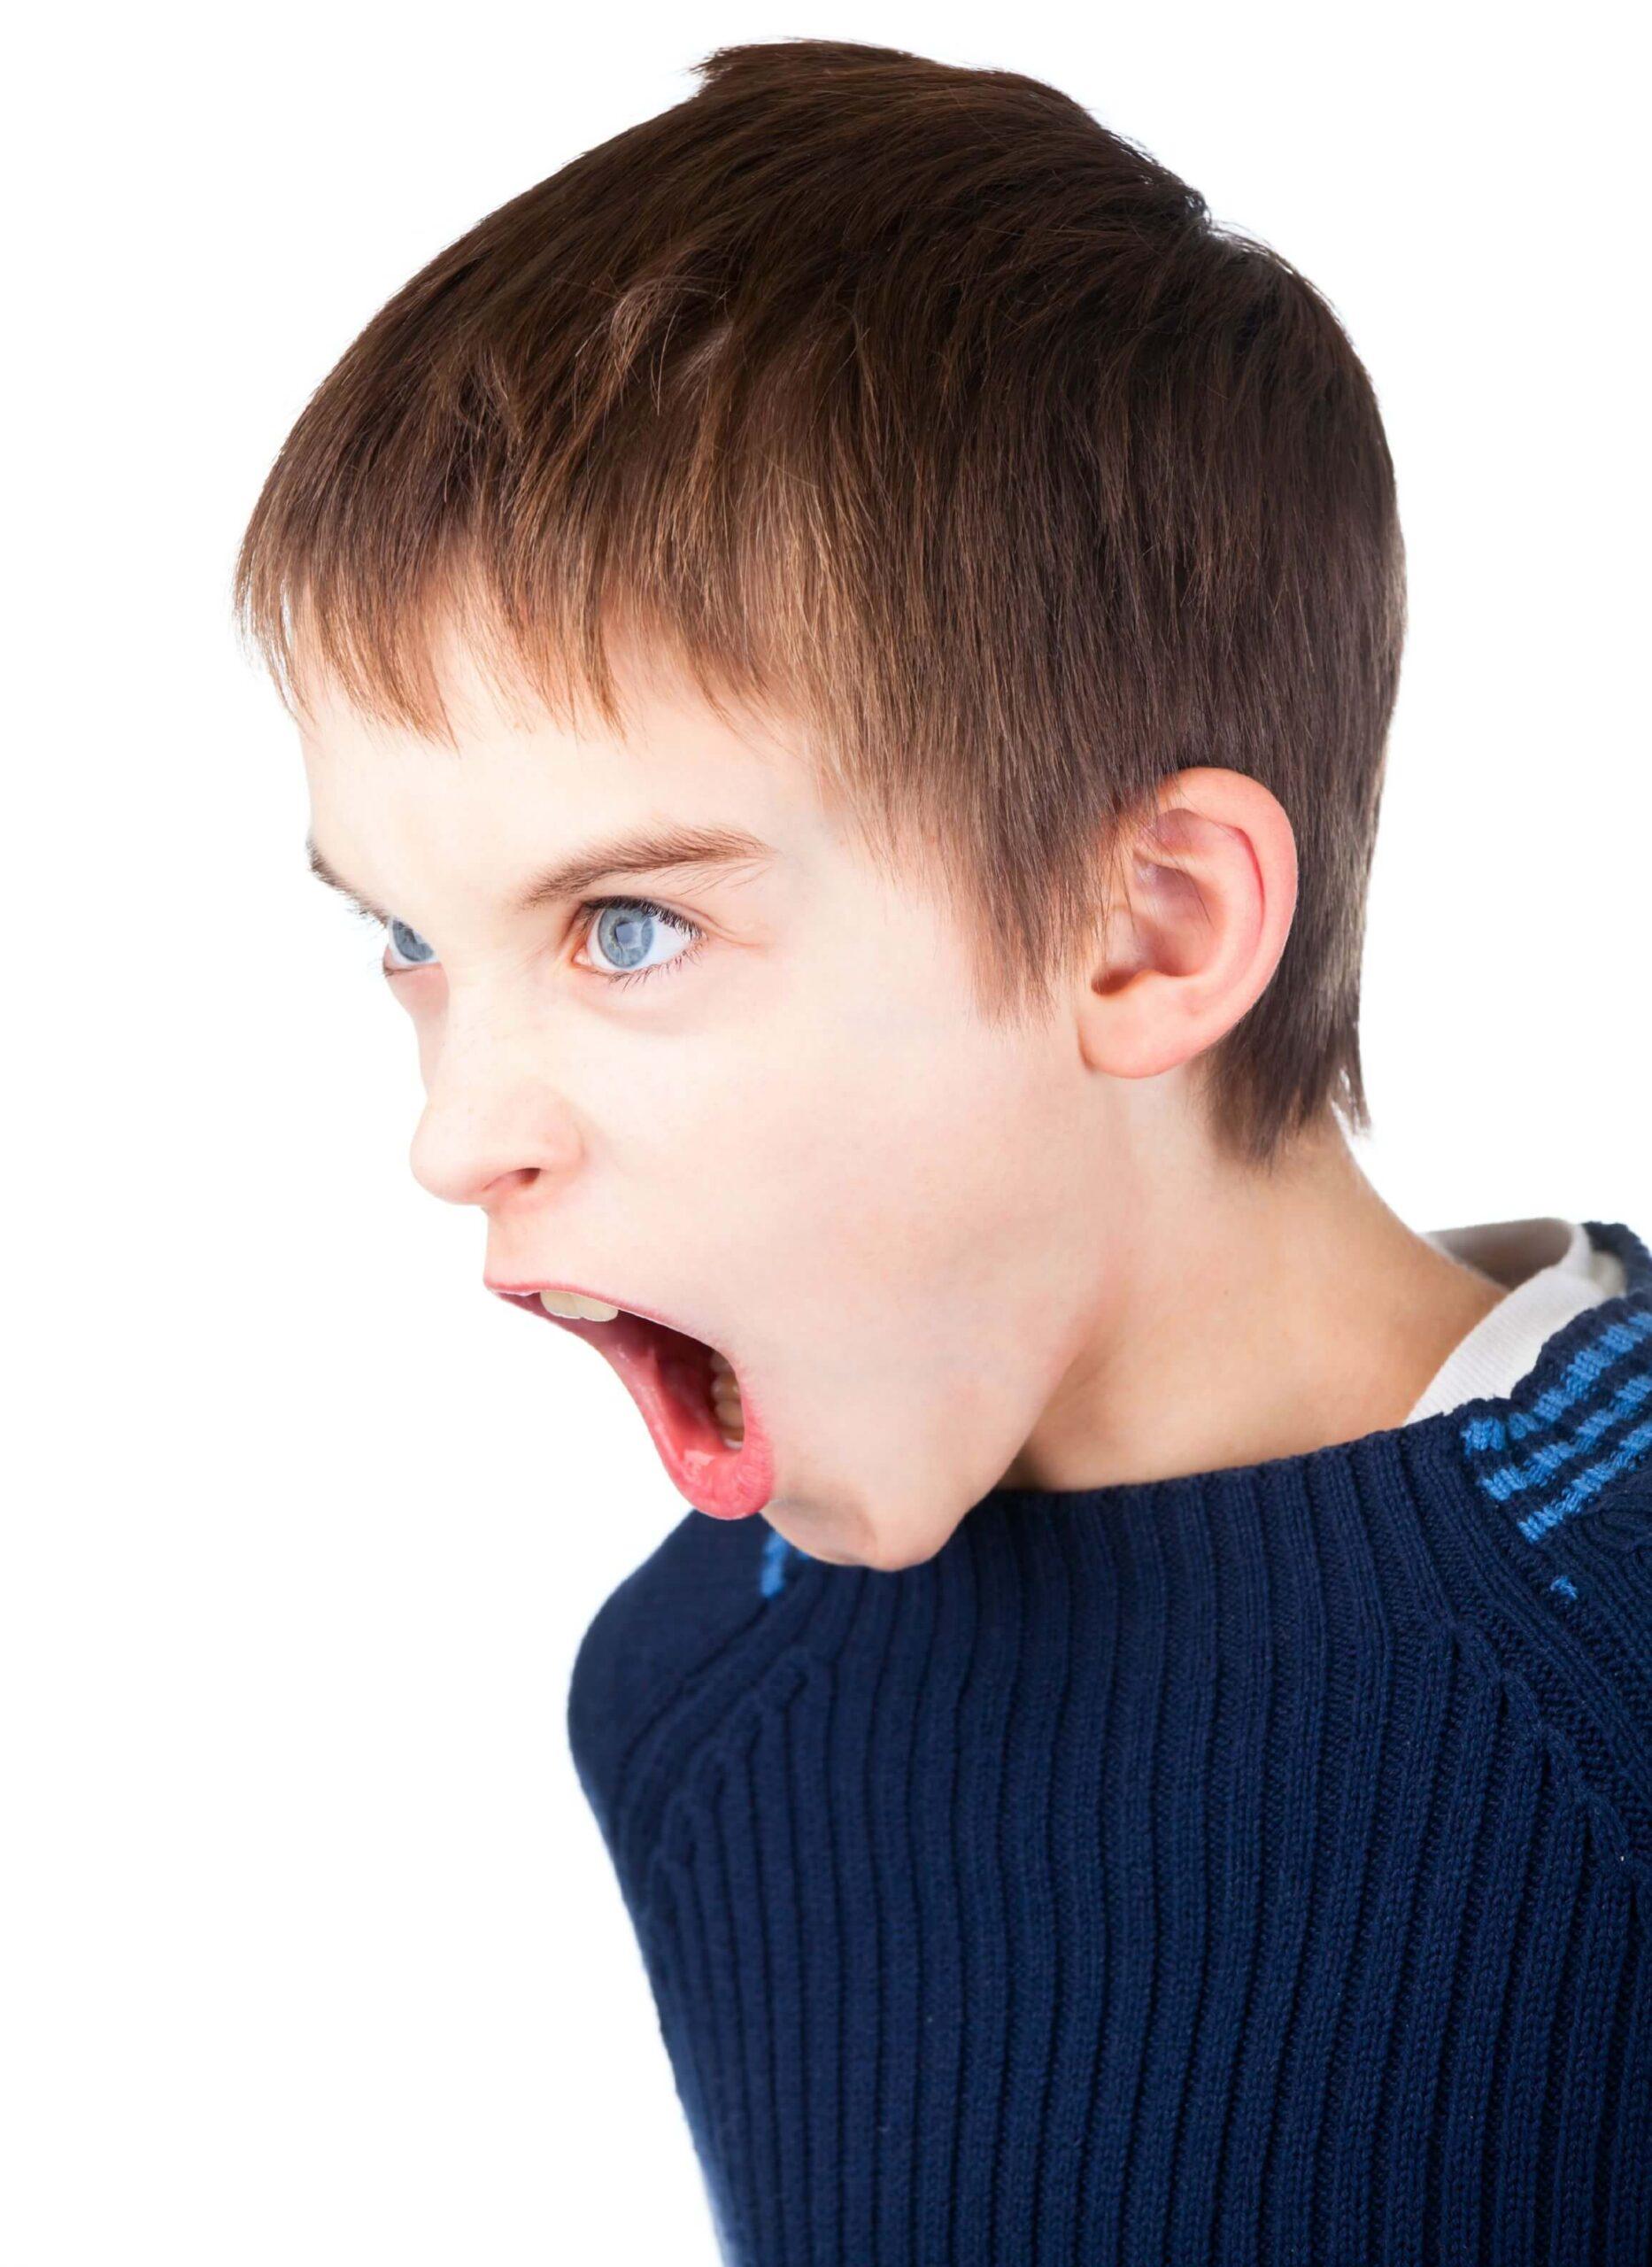 Teaching Kids How to Handle BIG Emotions